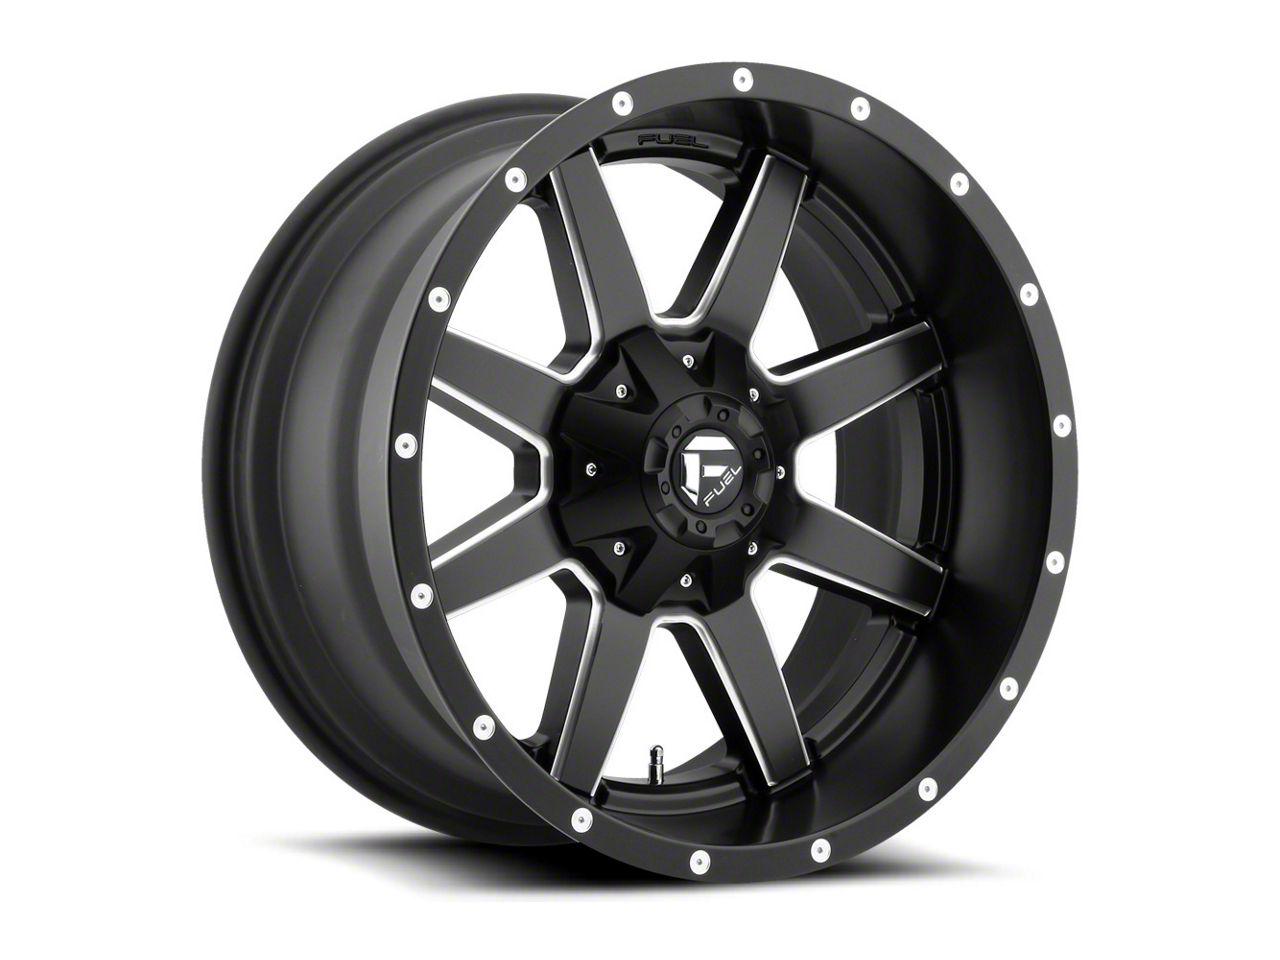 Fuel Wheels Maverick Black Milled 6-Lug Wheel - 22x9.5 (99-18 Silverado 1500)